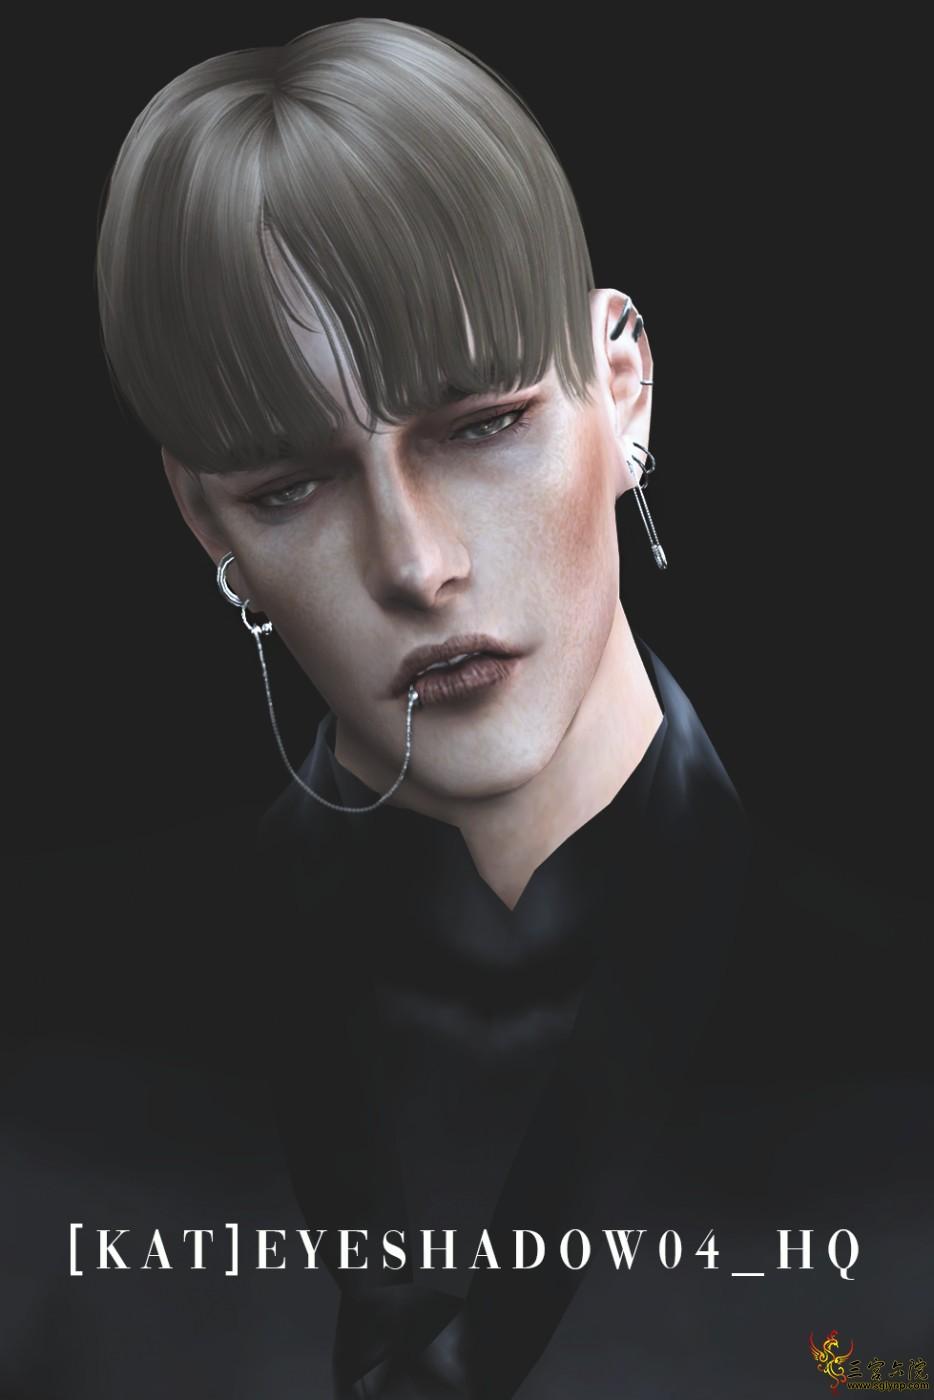 [KAT]eyeshadow04_HQ.png